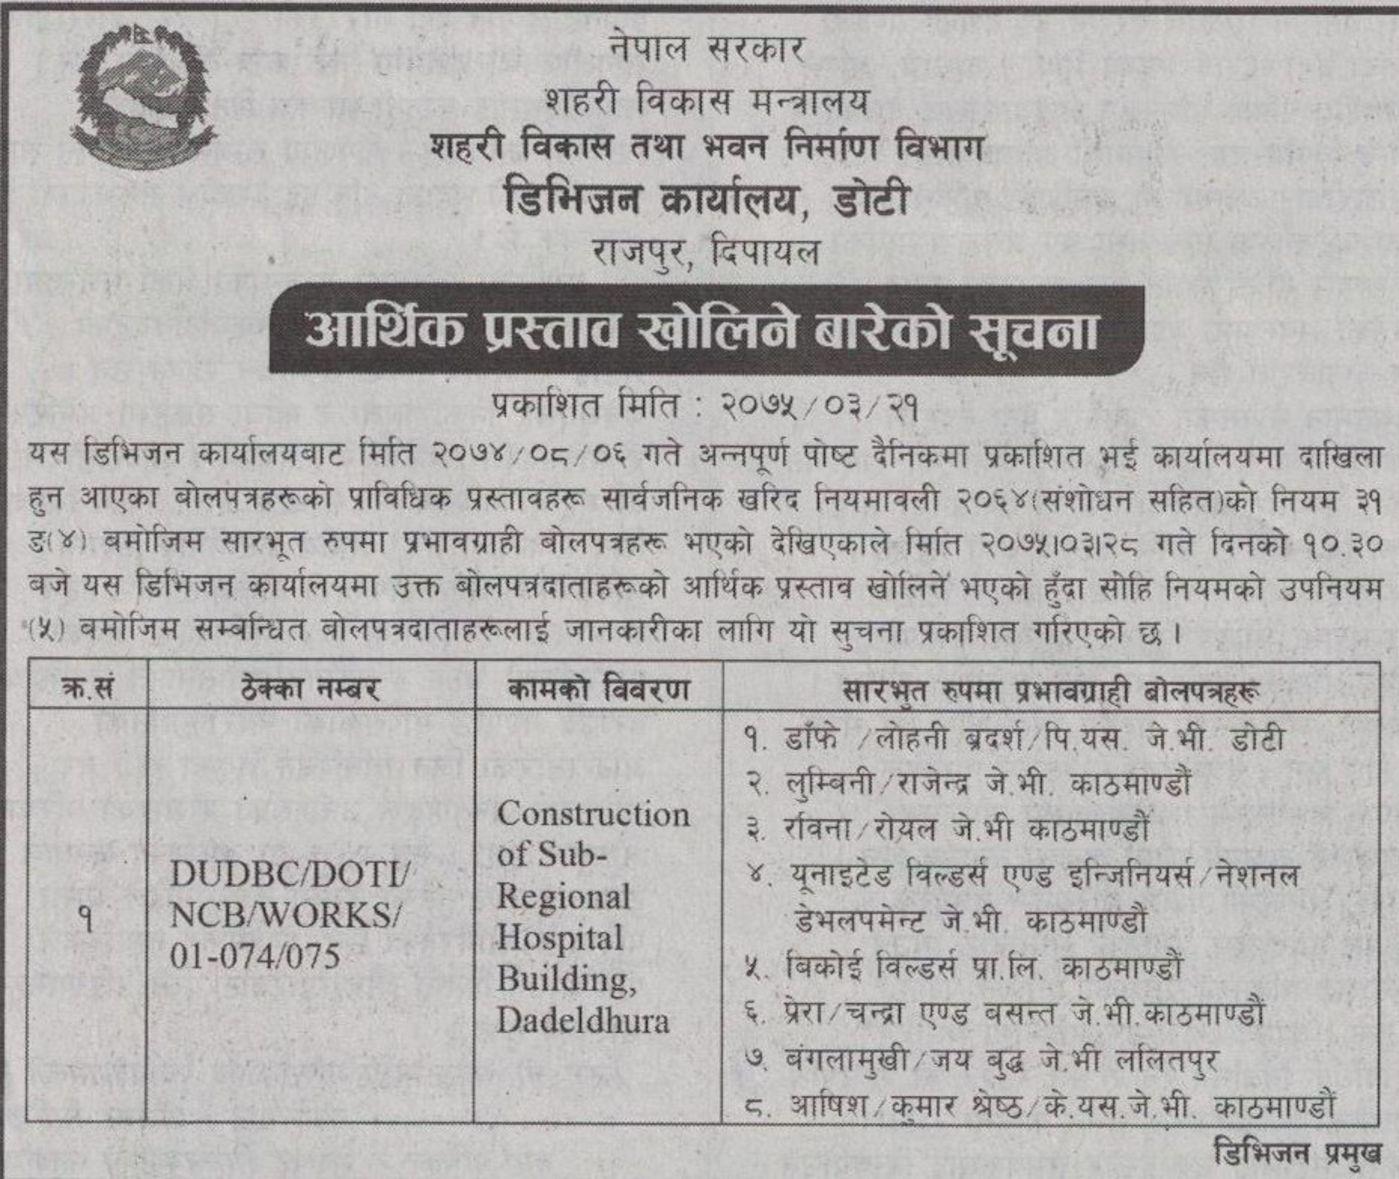 Bids and Tenders Nepal - Financial Proposal Opening - Sub-Regional